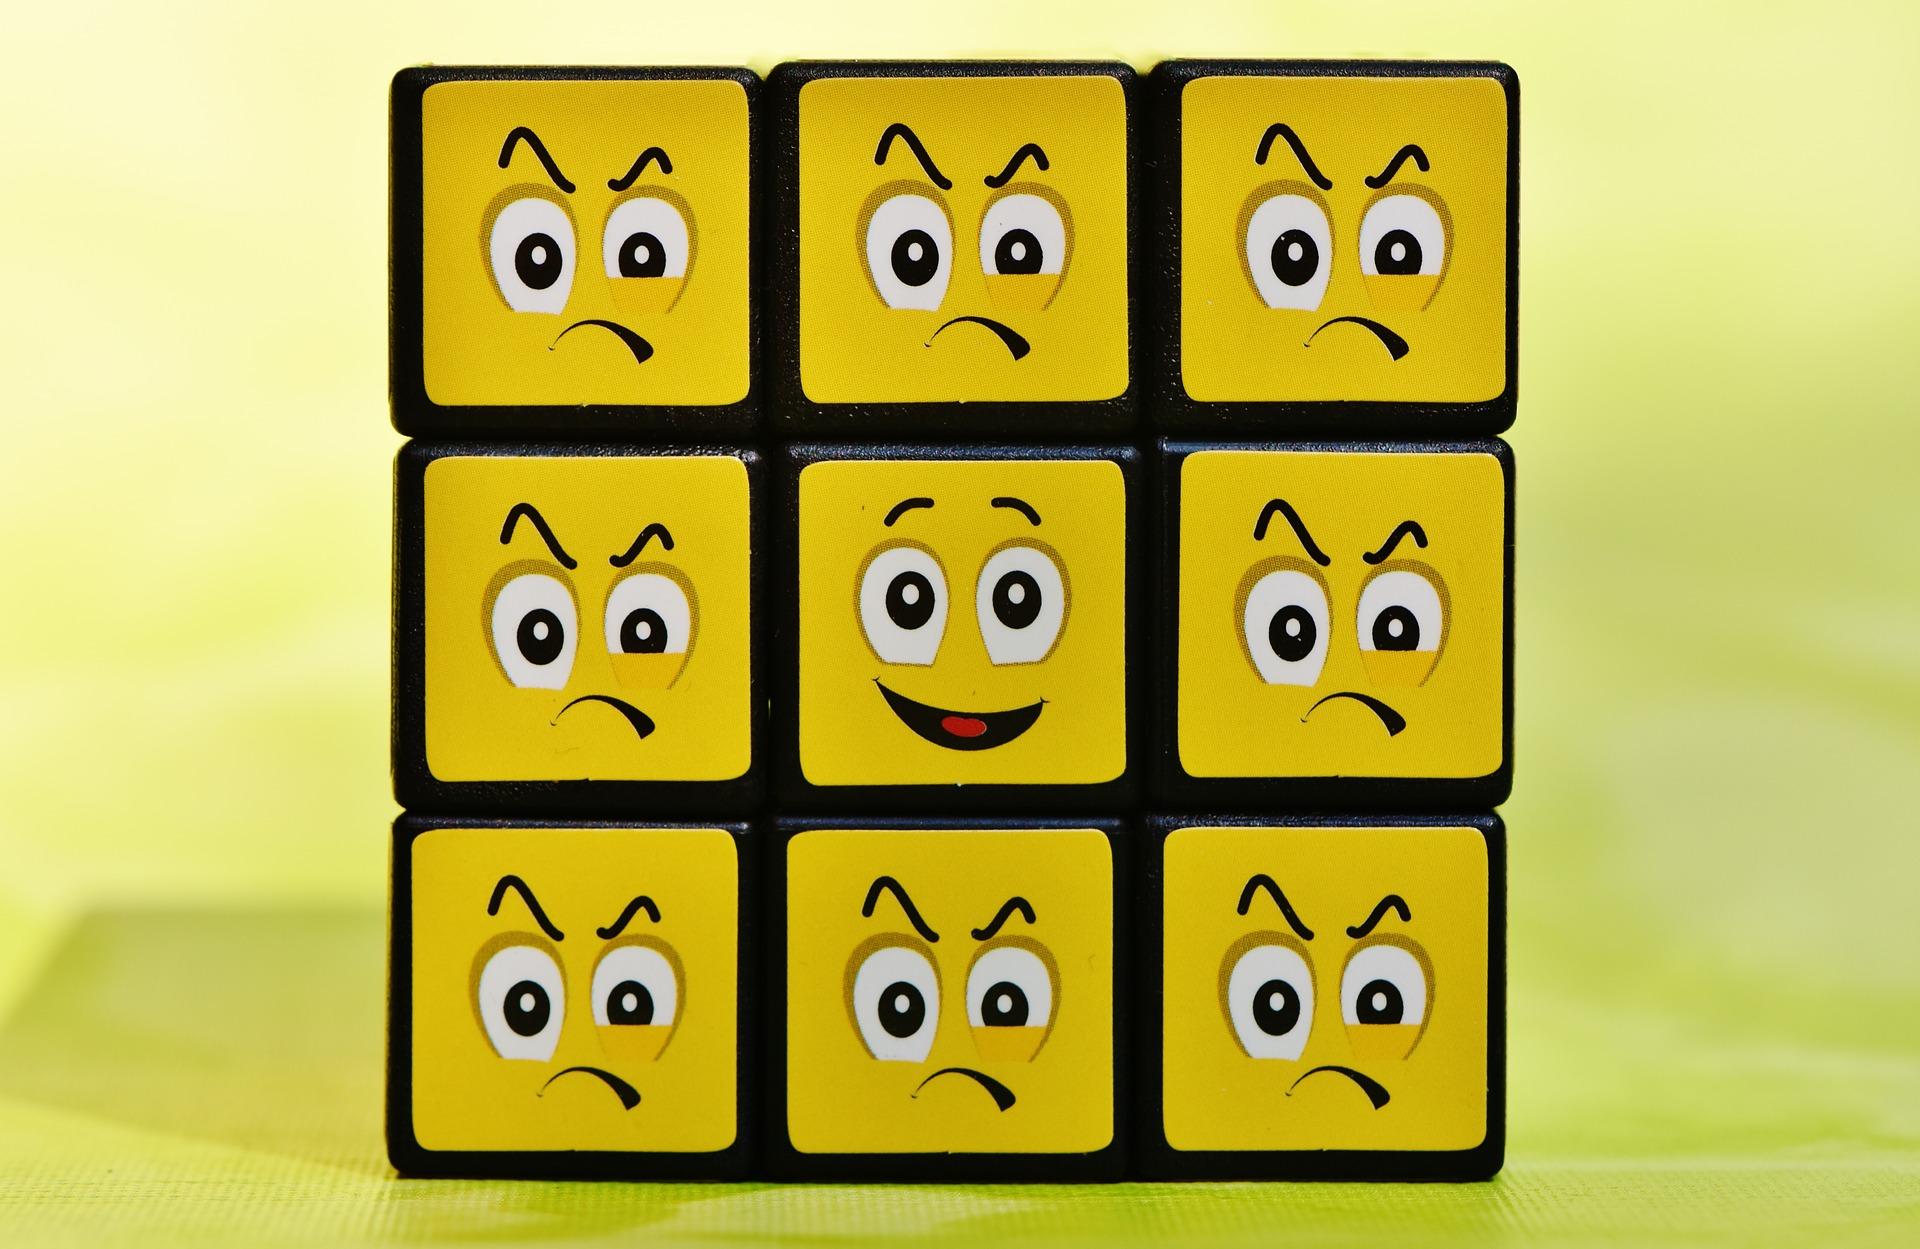 cube-1601971_1920